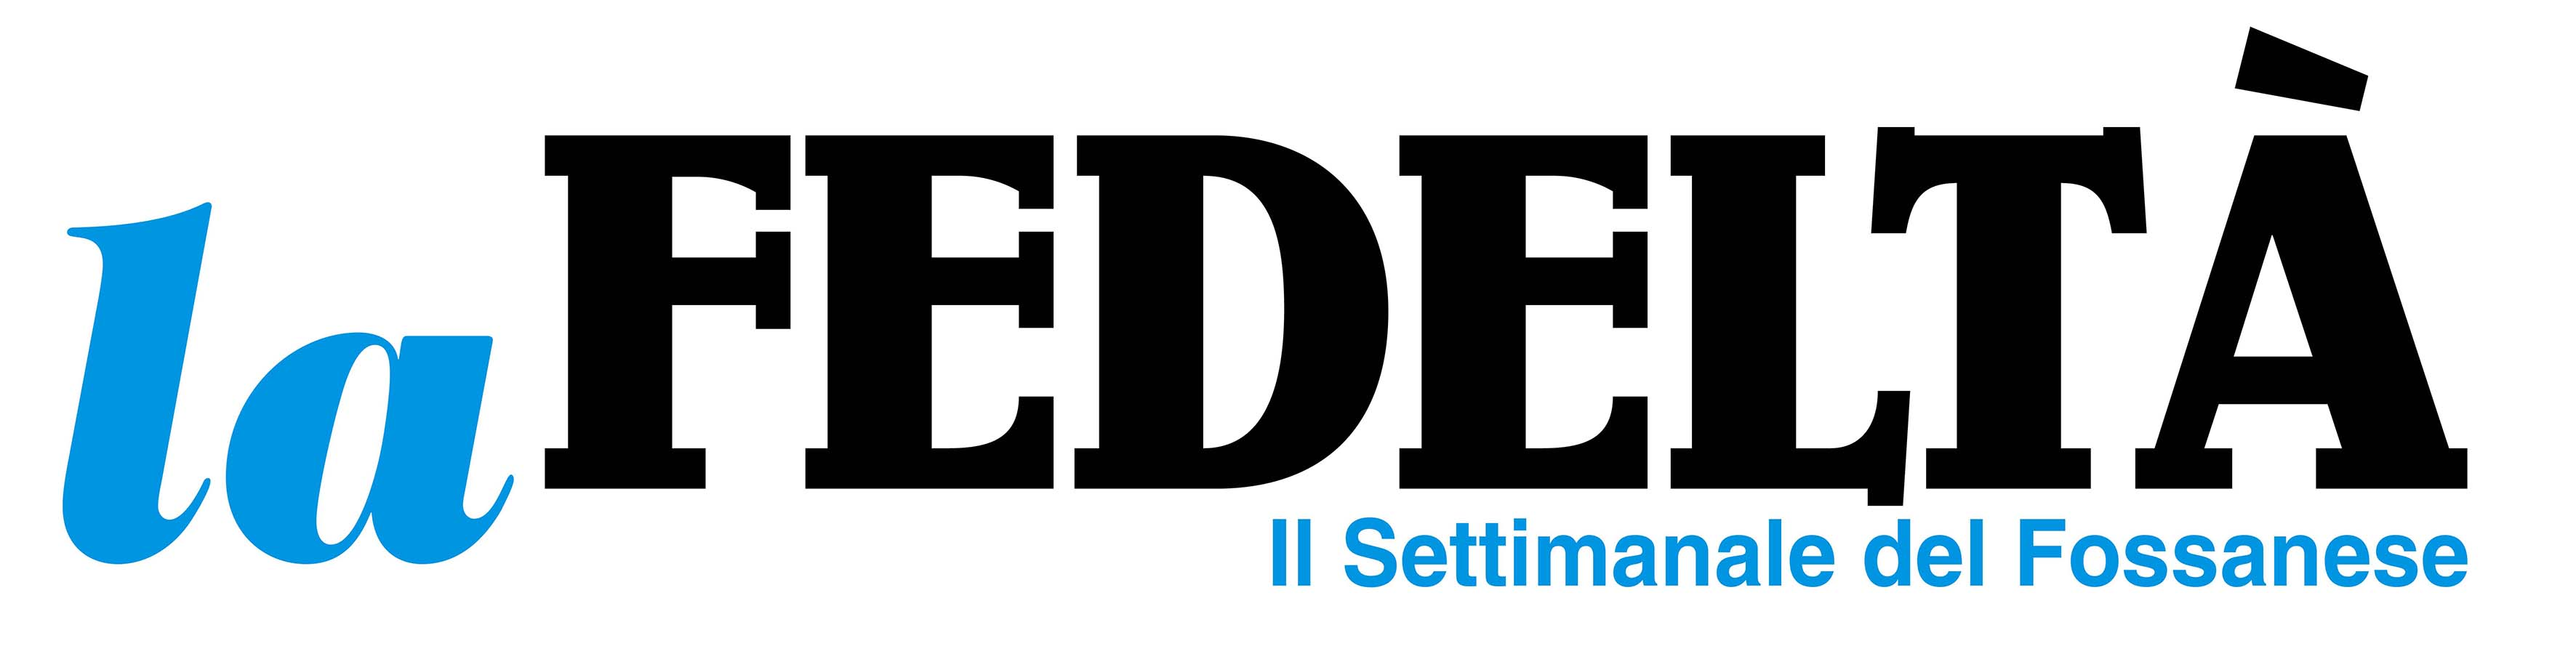 la-fedelta-logo-cai-2014